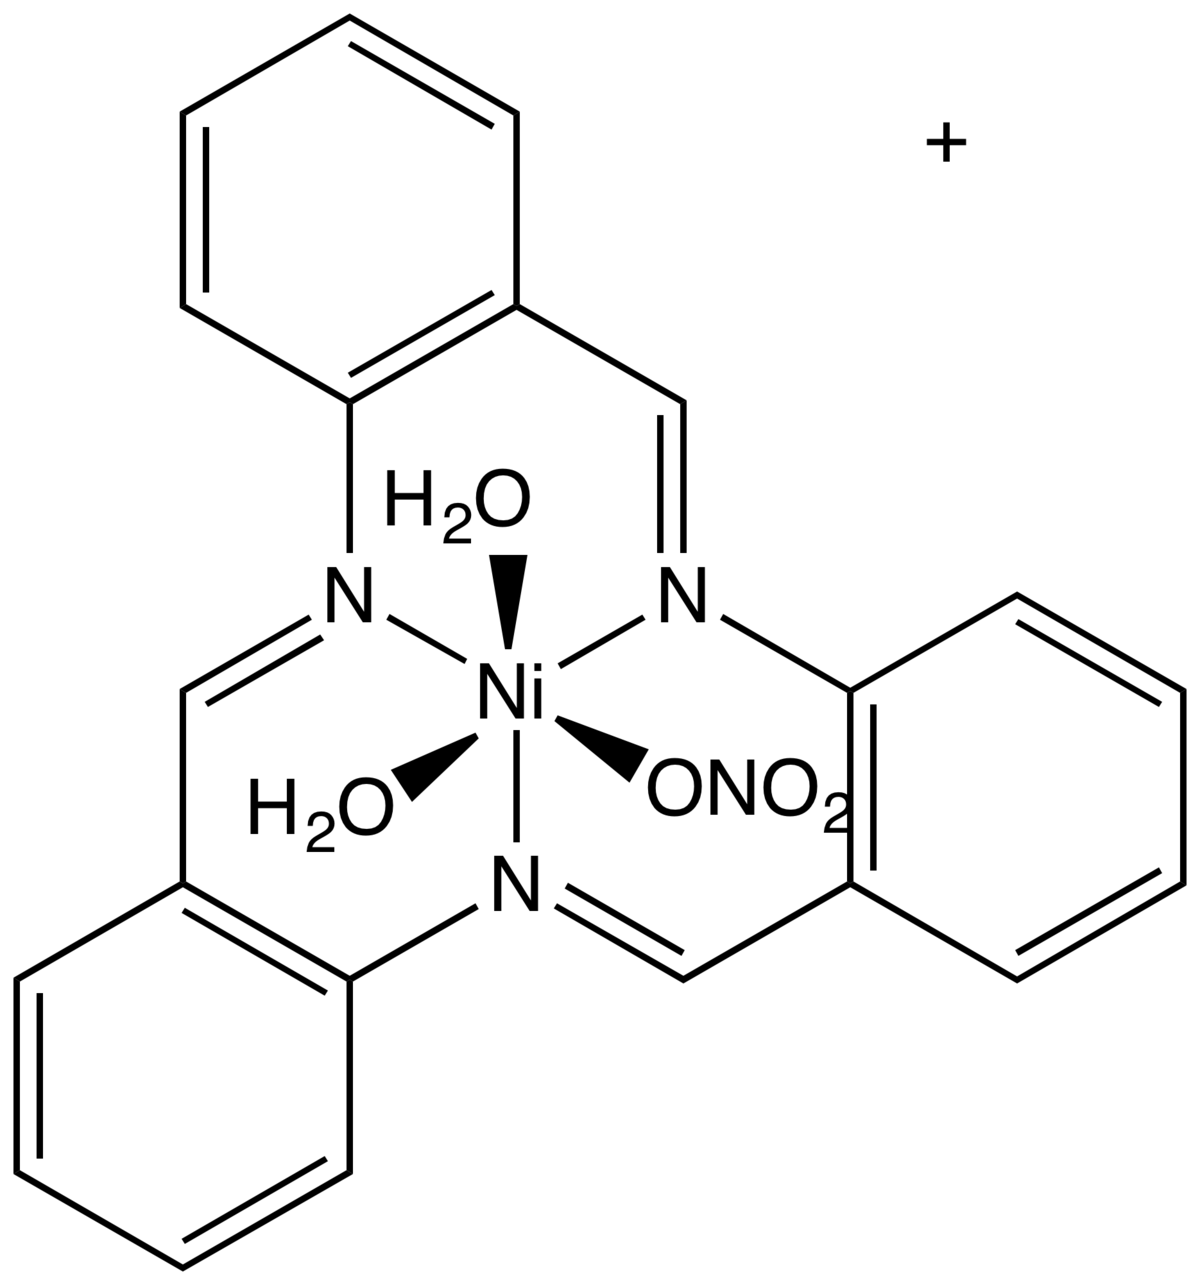 Template reaction - Wikipedia